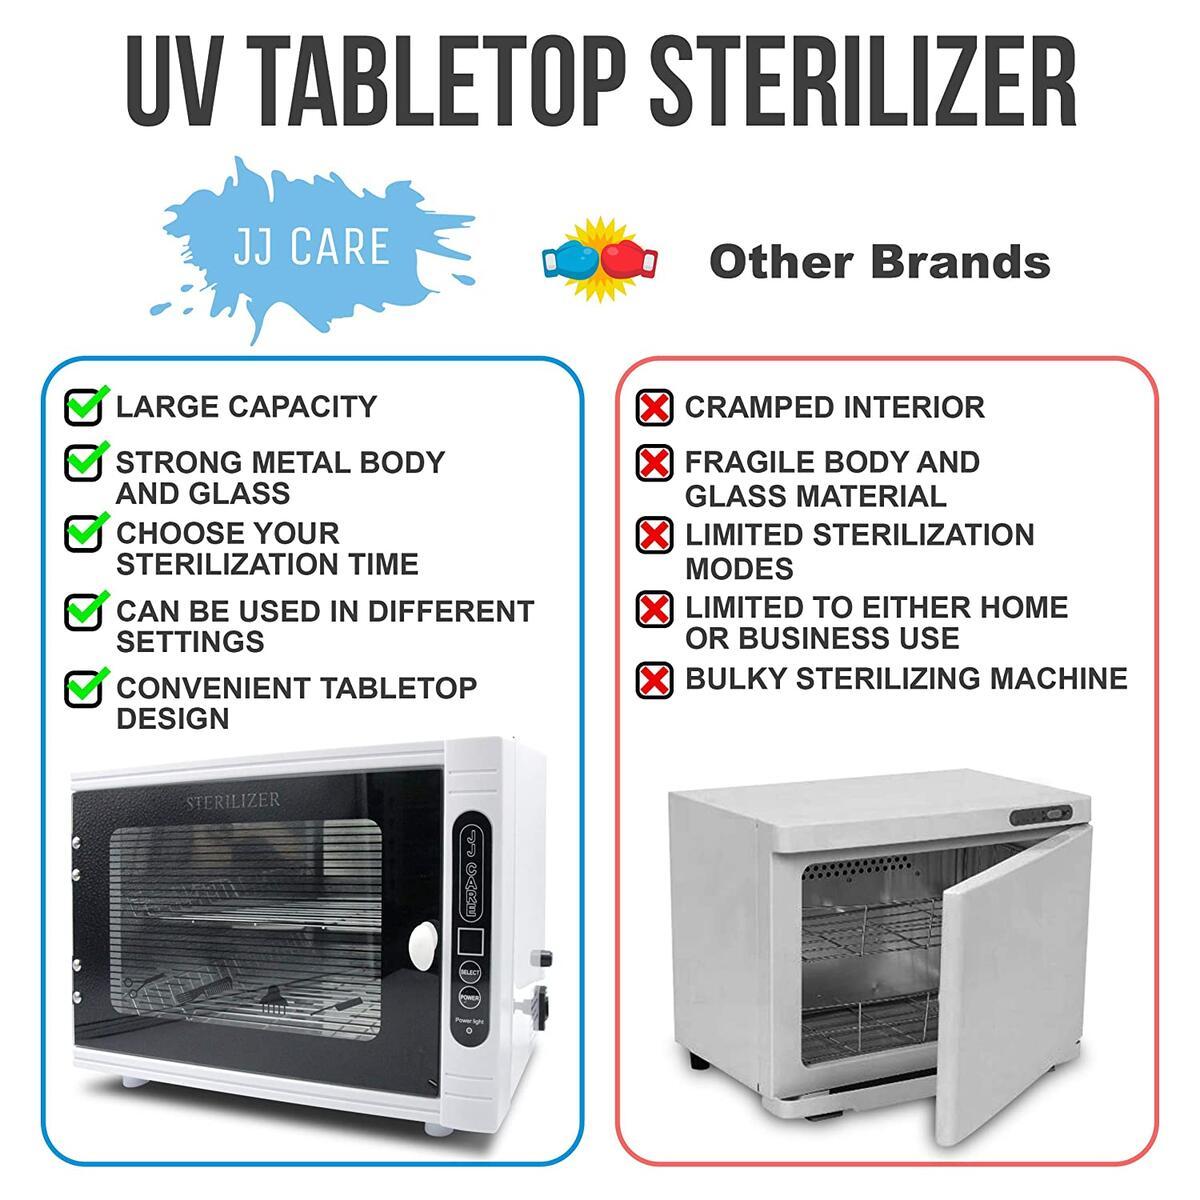 JJ CARE [PROFESSIONAL] UV Sterilizer Box for Salon, UV Light Sanitizer Box, 8L Capacity UV Sterilizer Machine for Salon and Beauty Tools, UV Tabletop Sterilizer, UV Disinfection Box